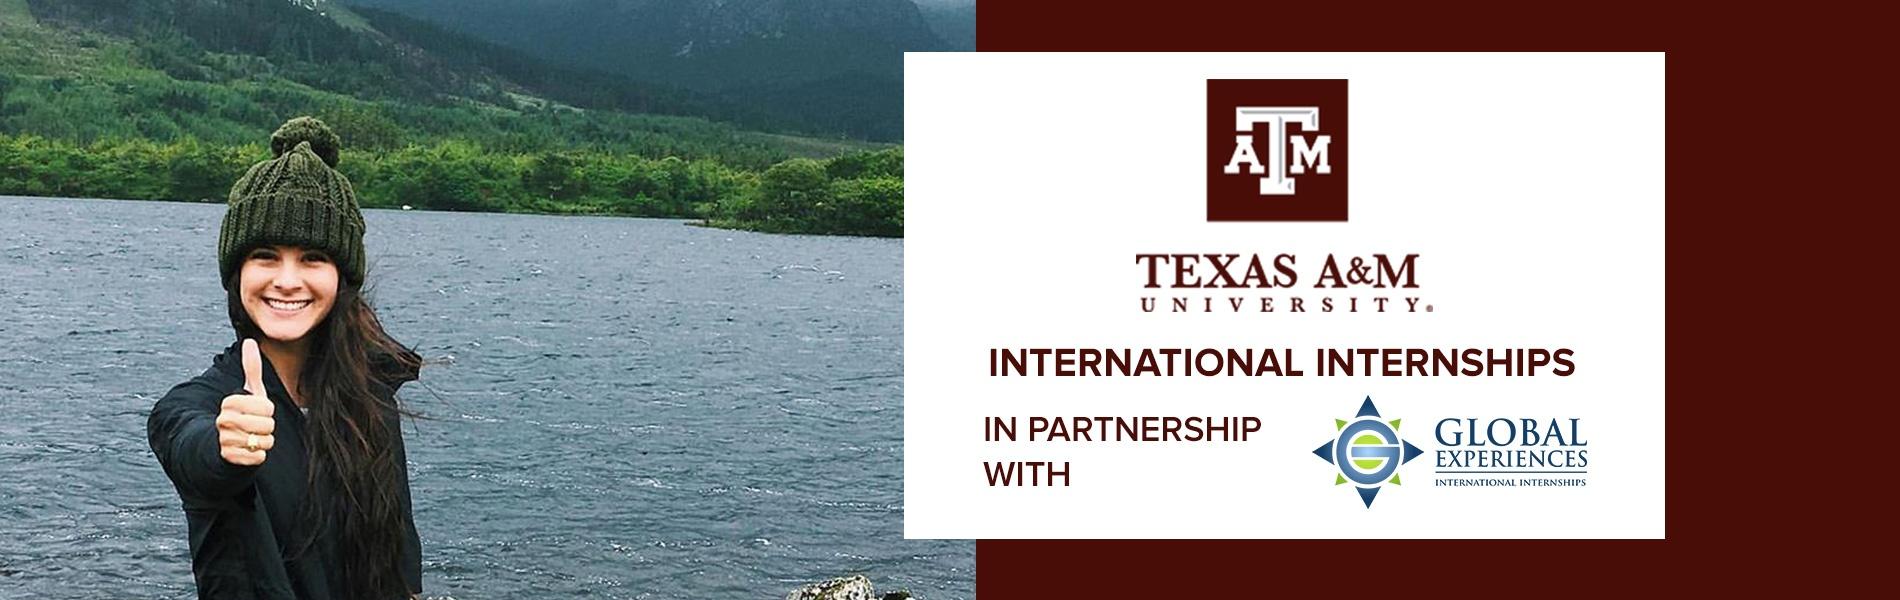 Texas A&M University Intern abroad